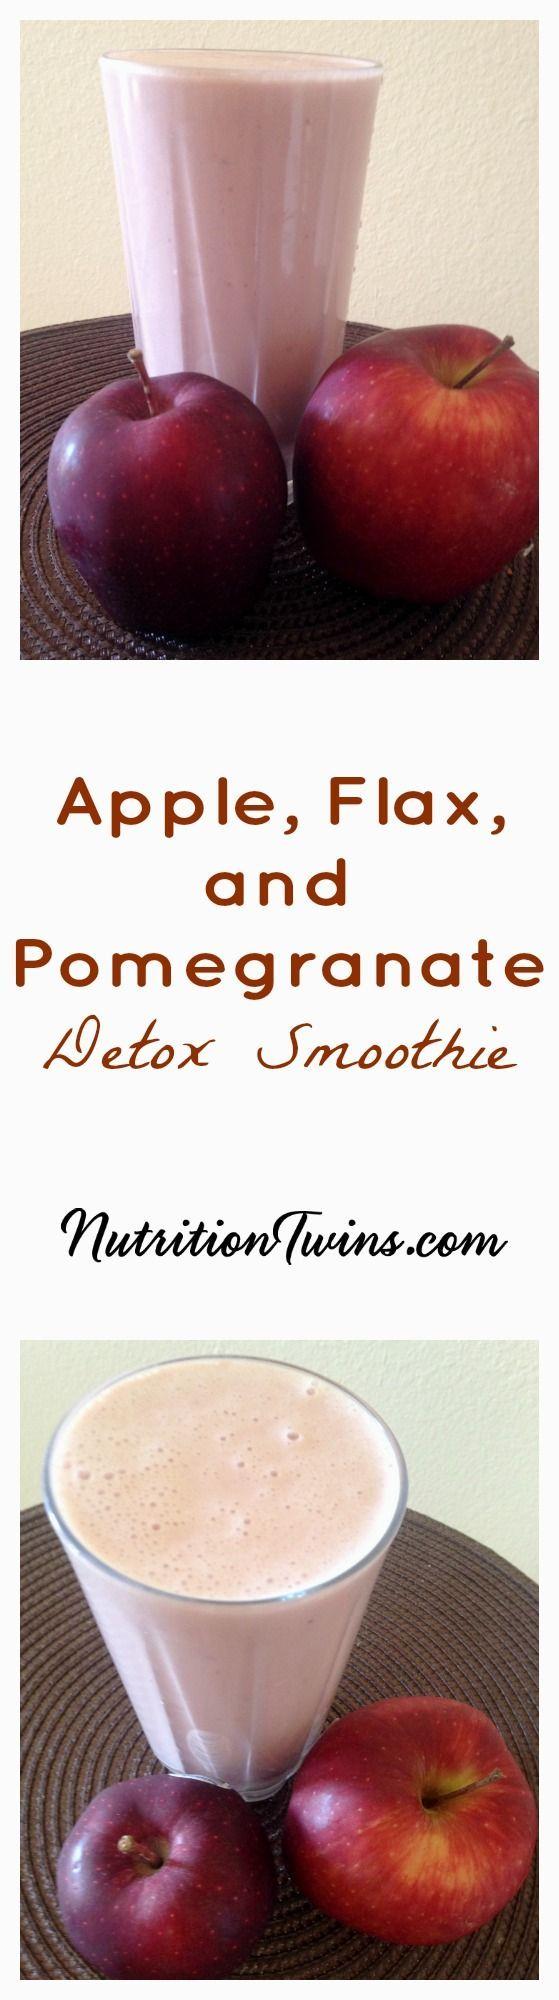 #wwwnutritiontwinscom #overindulgence #antioxidants #pomegranate #newsletter #breakfast #nutrition #...